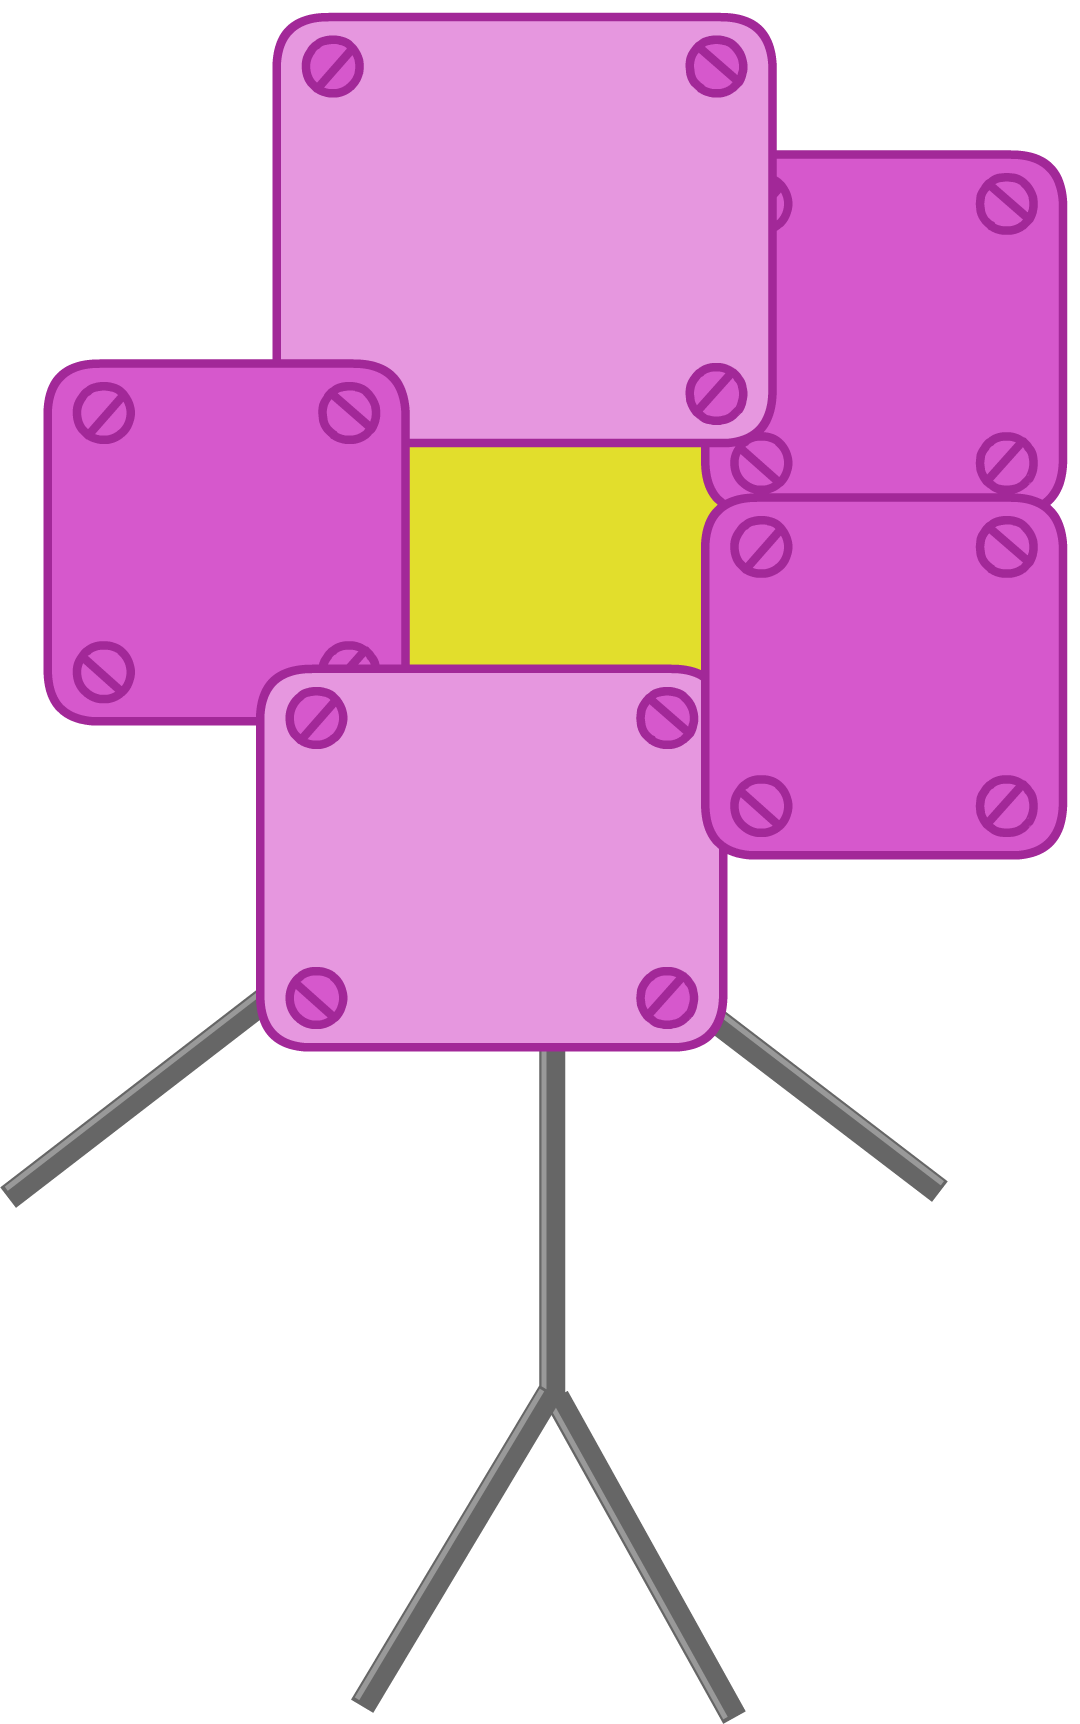 Bfb Robot Flower - Classycloud co